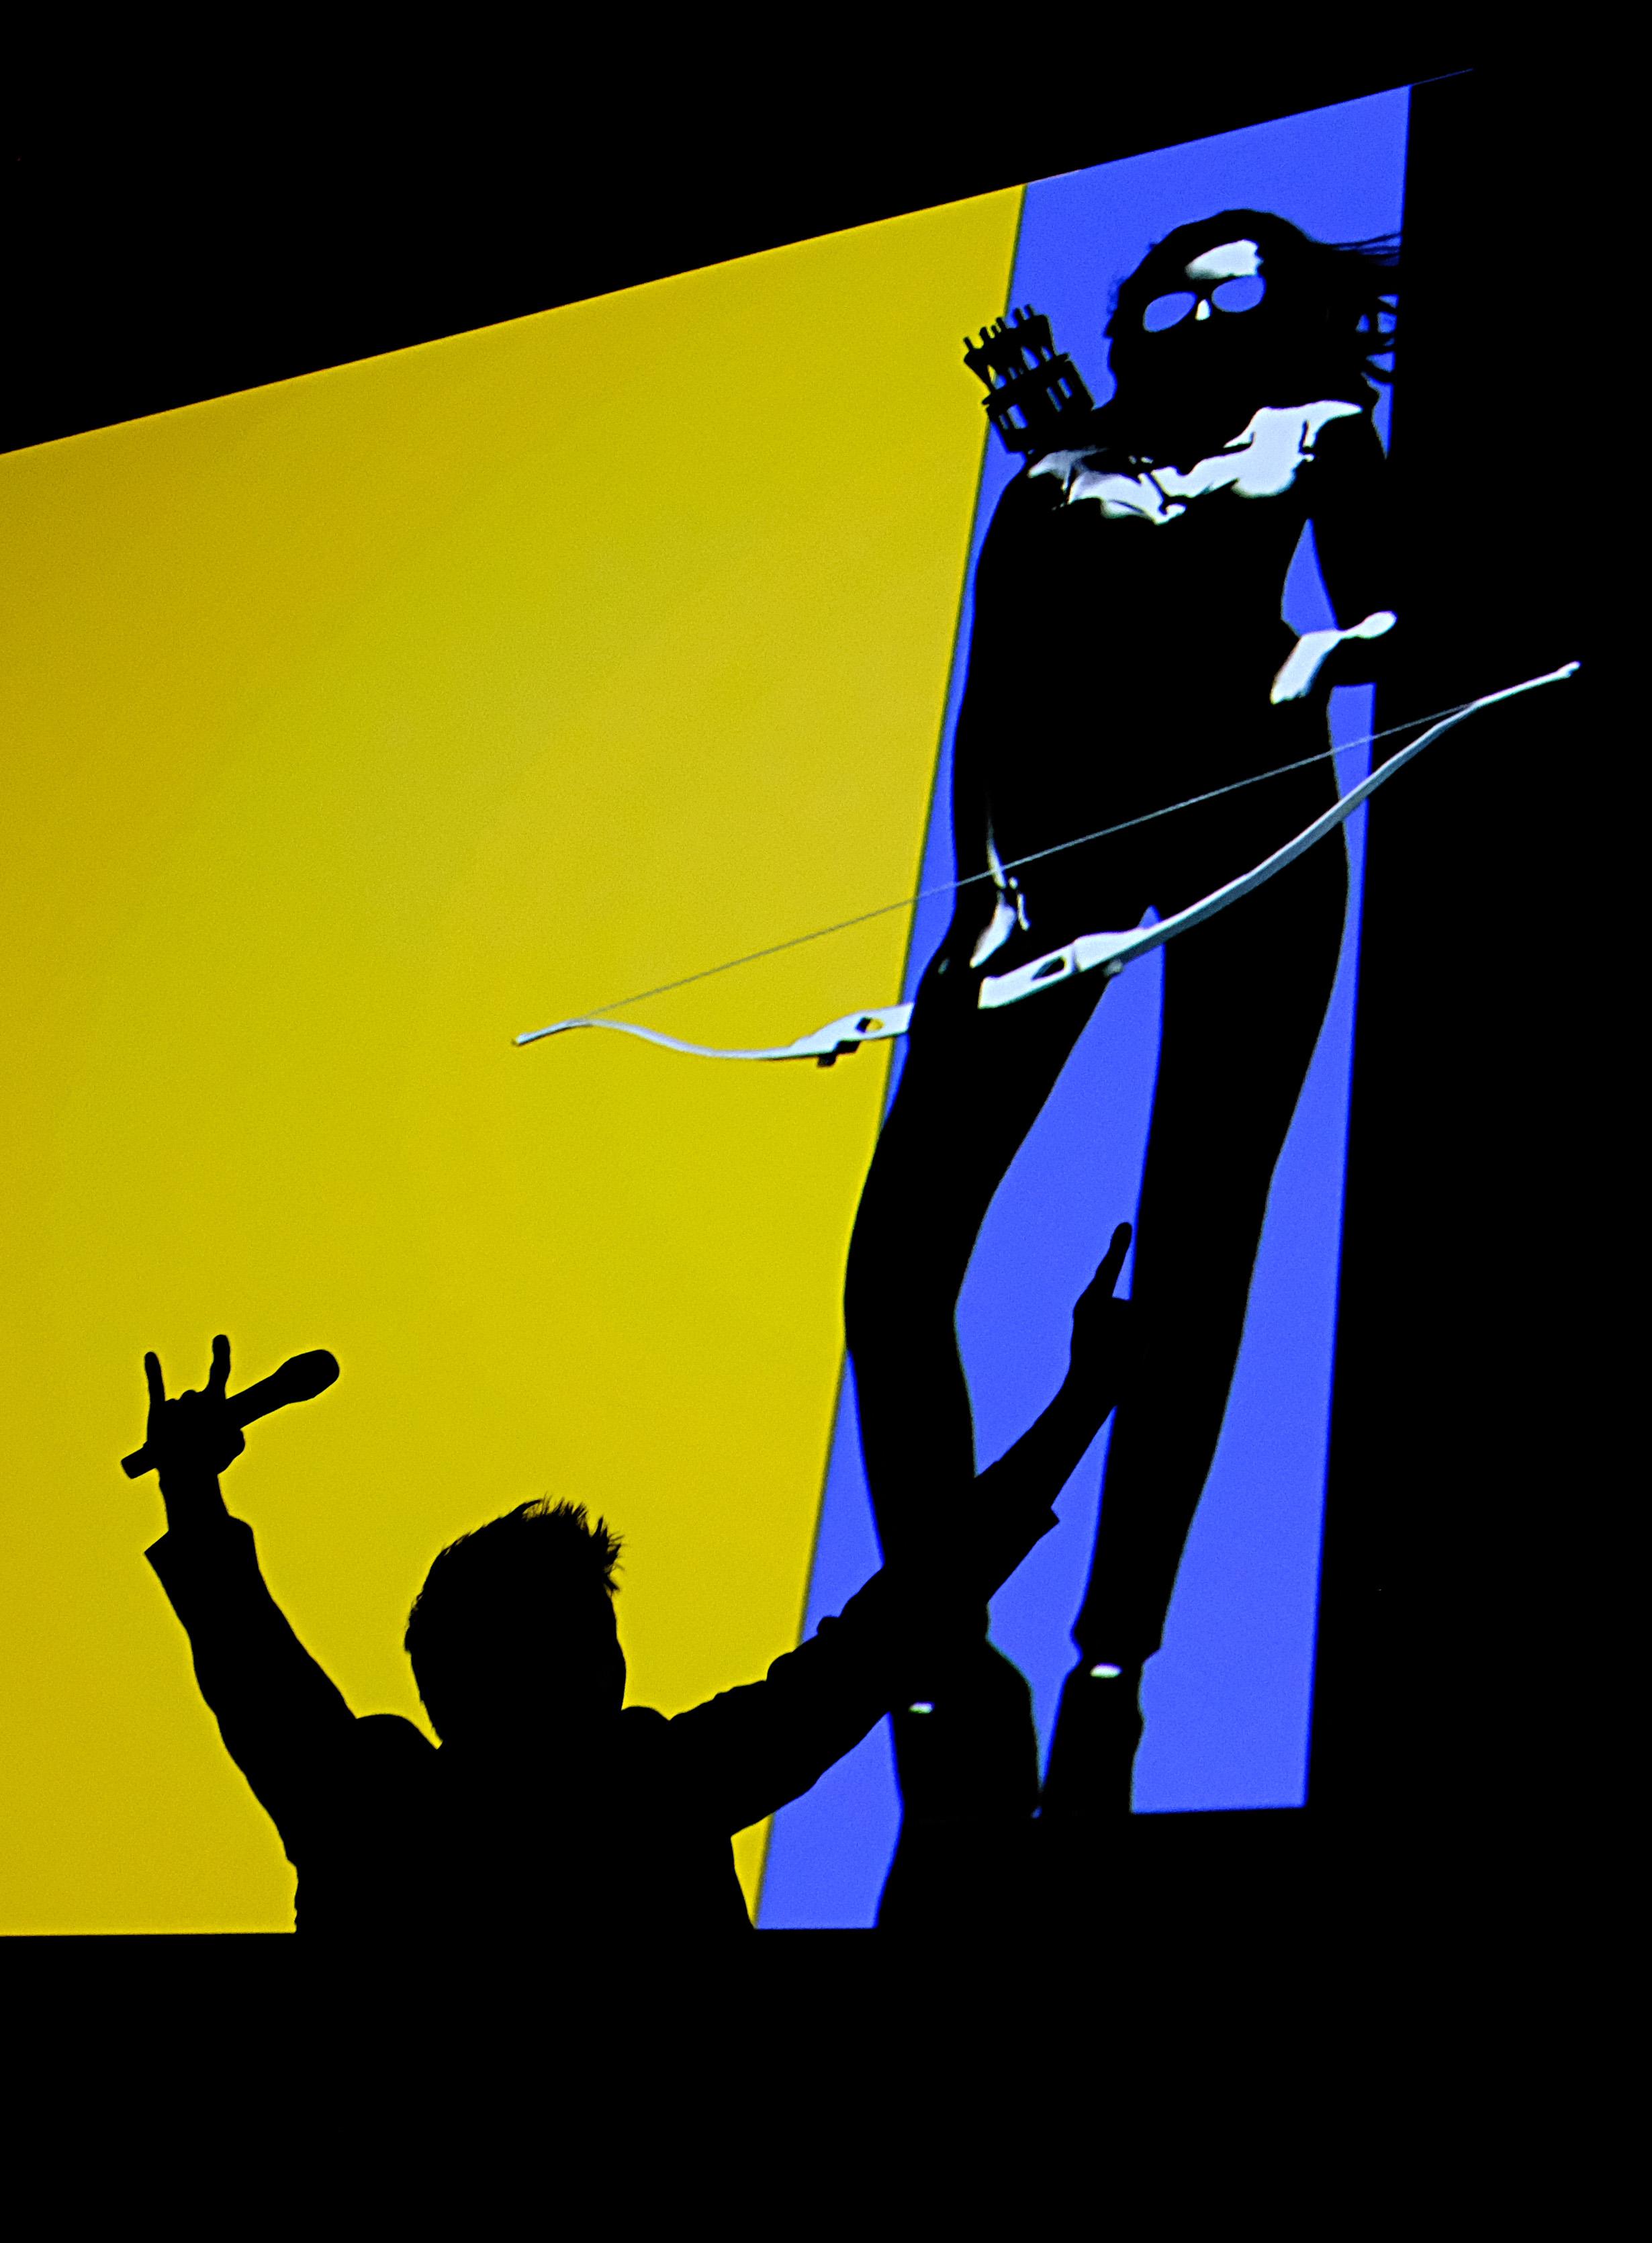 Jeremy Renner durante el panel de Hawkeye.